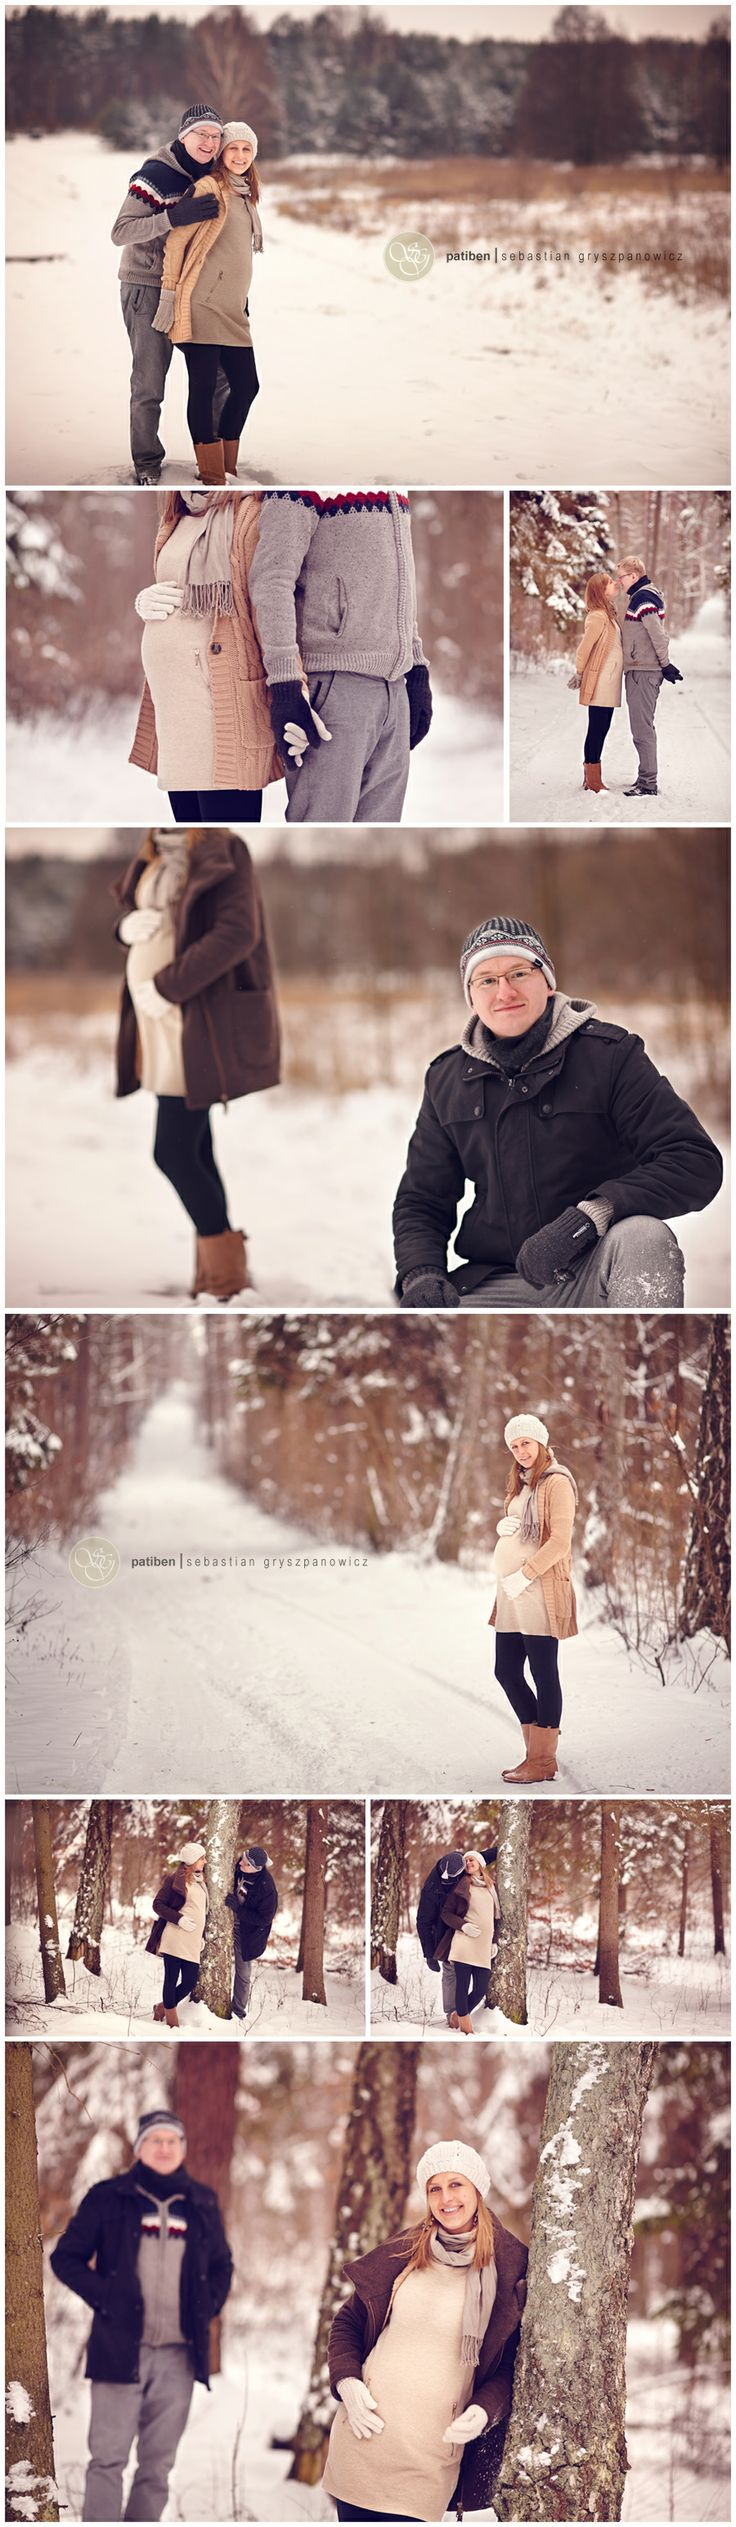 Patiben - Sebastian Gryszpanowicz, Maternity, Pregnancy, Sesja brzuszkowa,